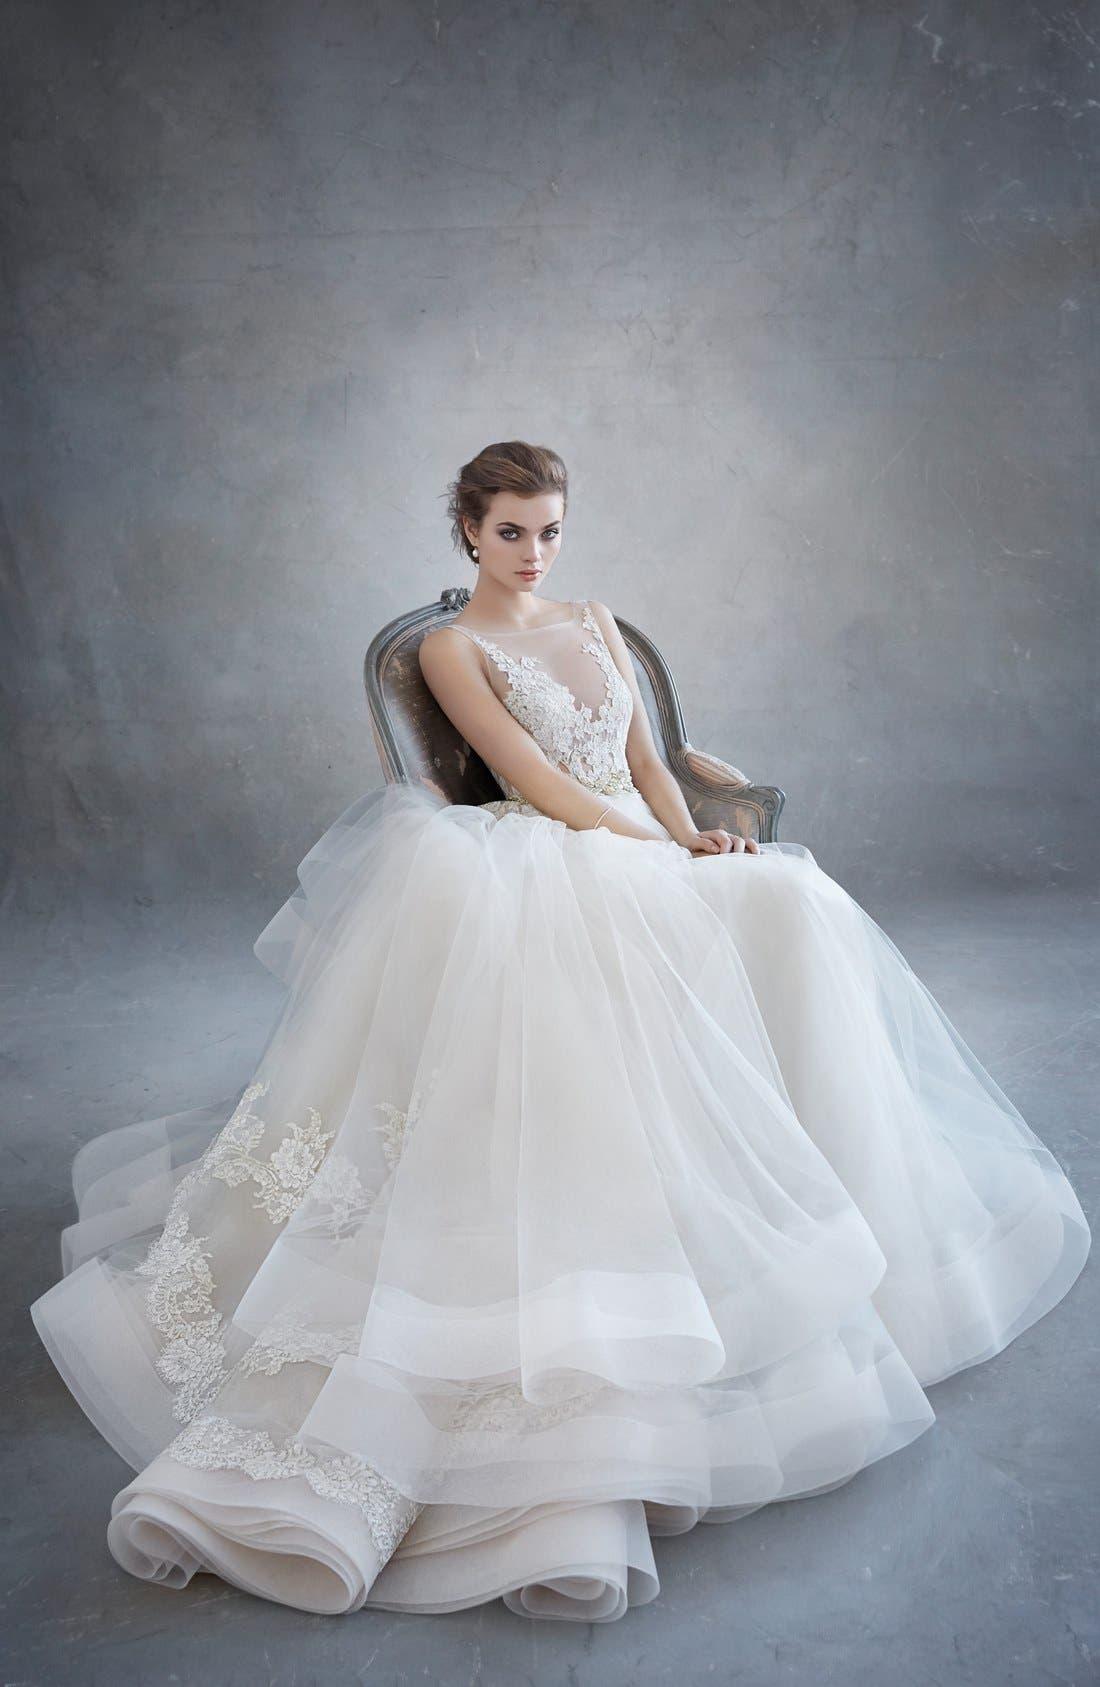 Lace Appliqué Tulle Ballgown Dress,                             Alternate thumbnail 3, color,                             Ivory/Gold/Champagne